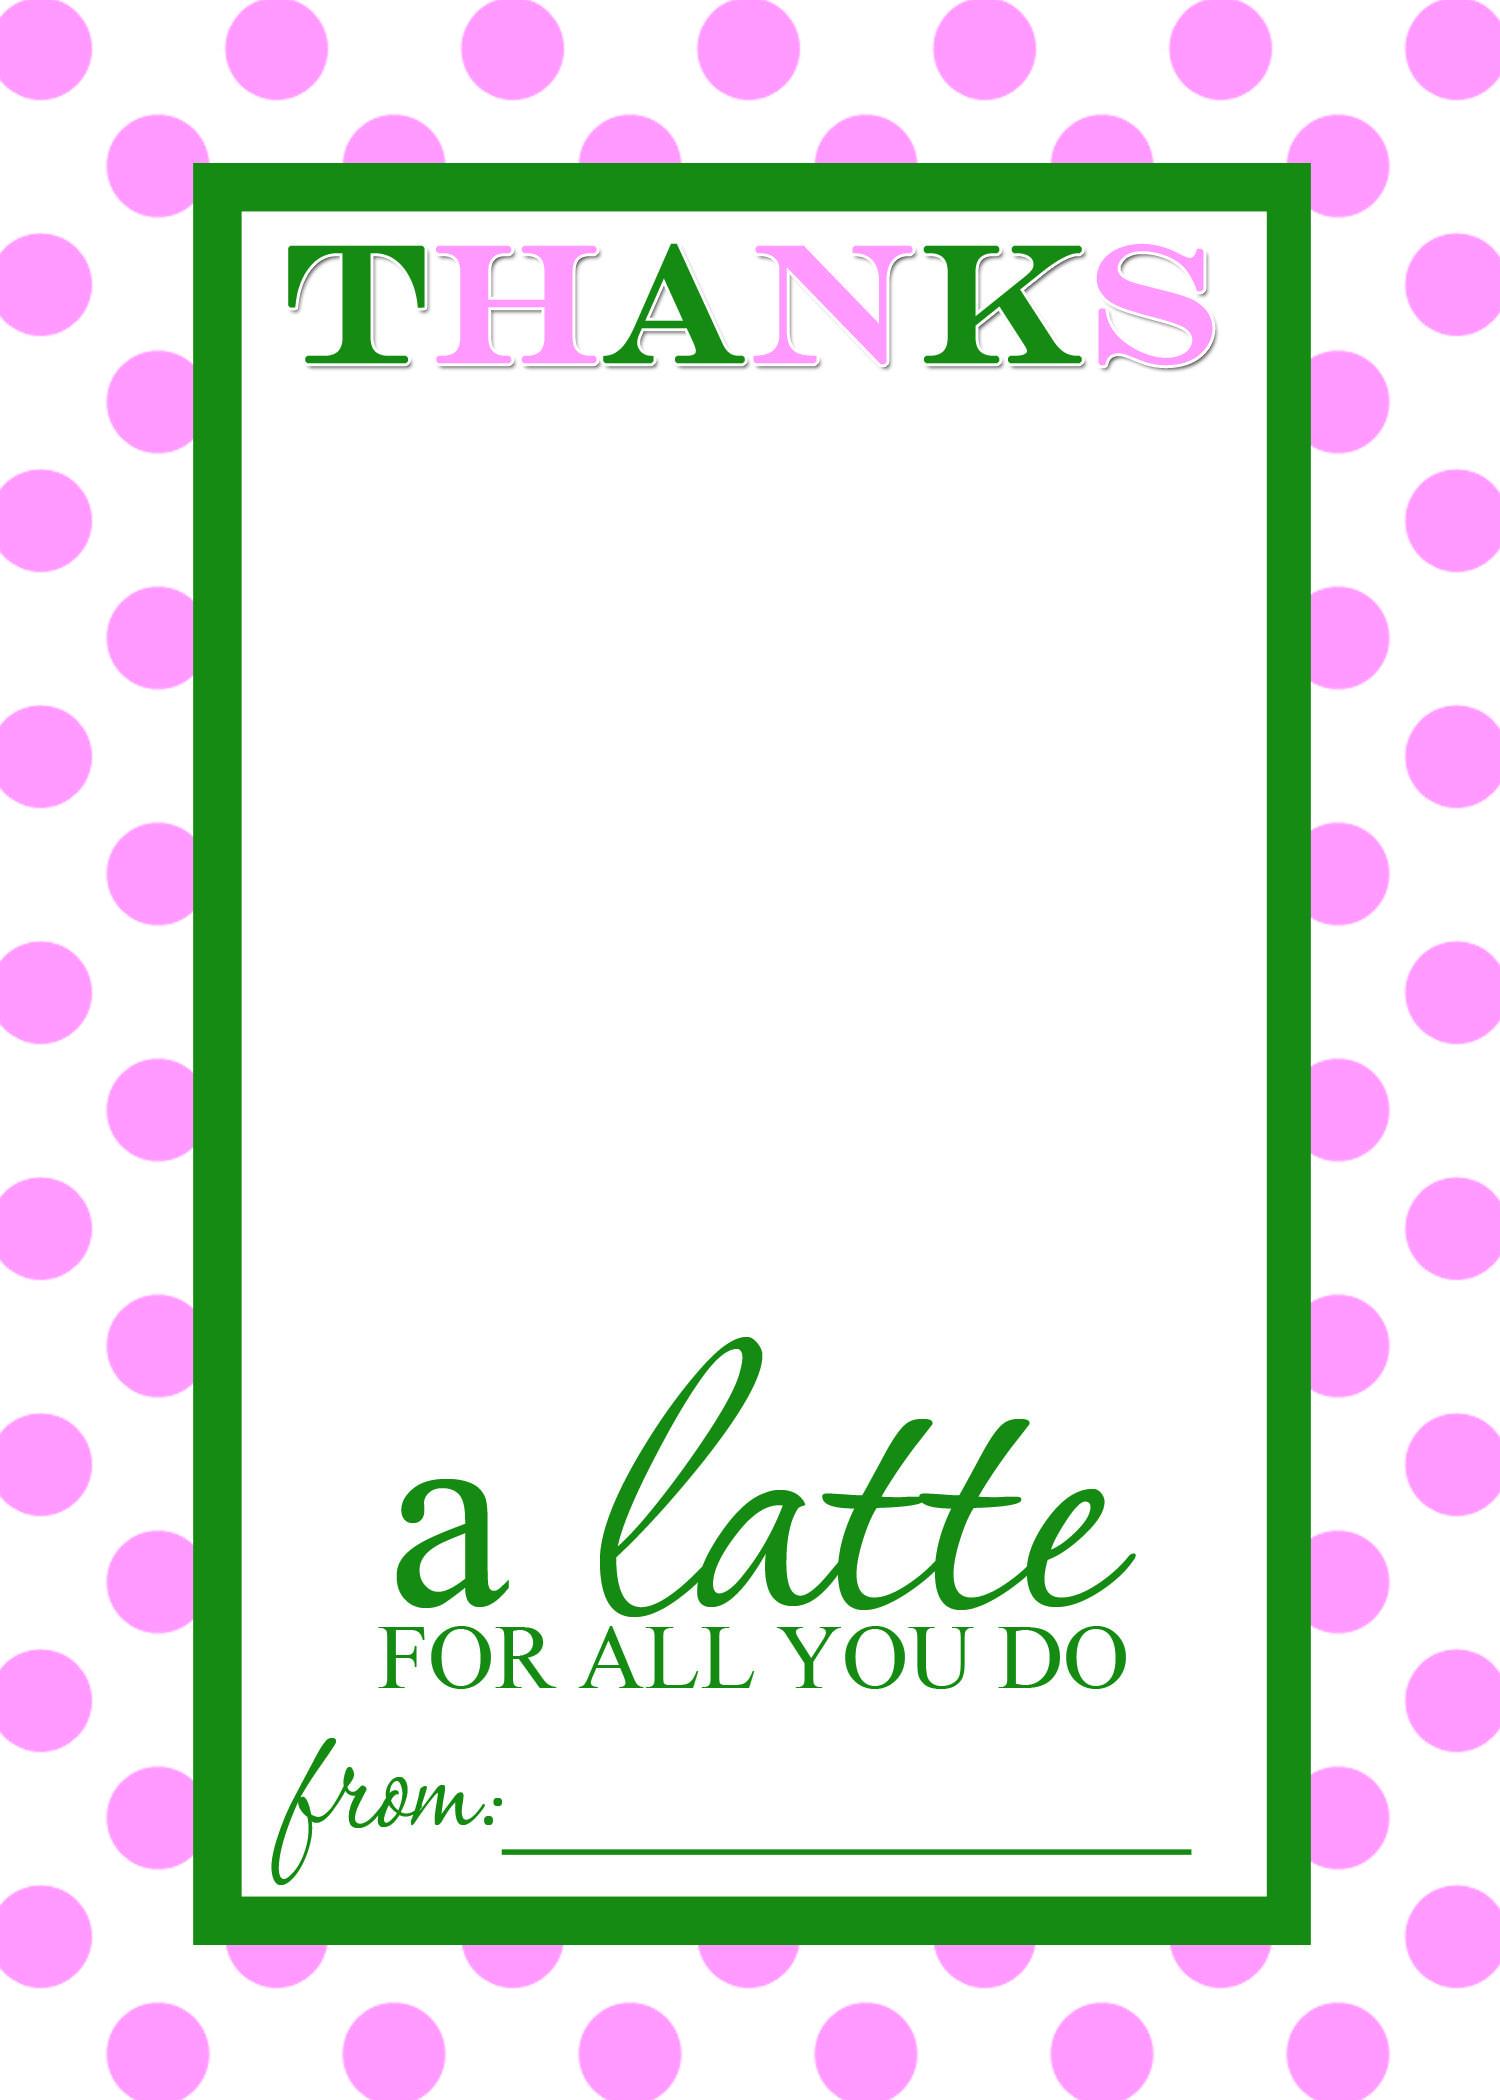 Teacher Appreciation Gift Idea - Thanks A Latte Free Printable Card - Thanks A Latte Free Printable Card